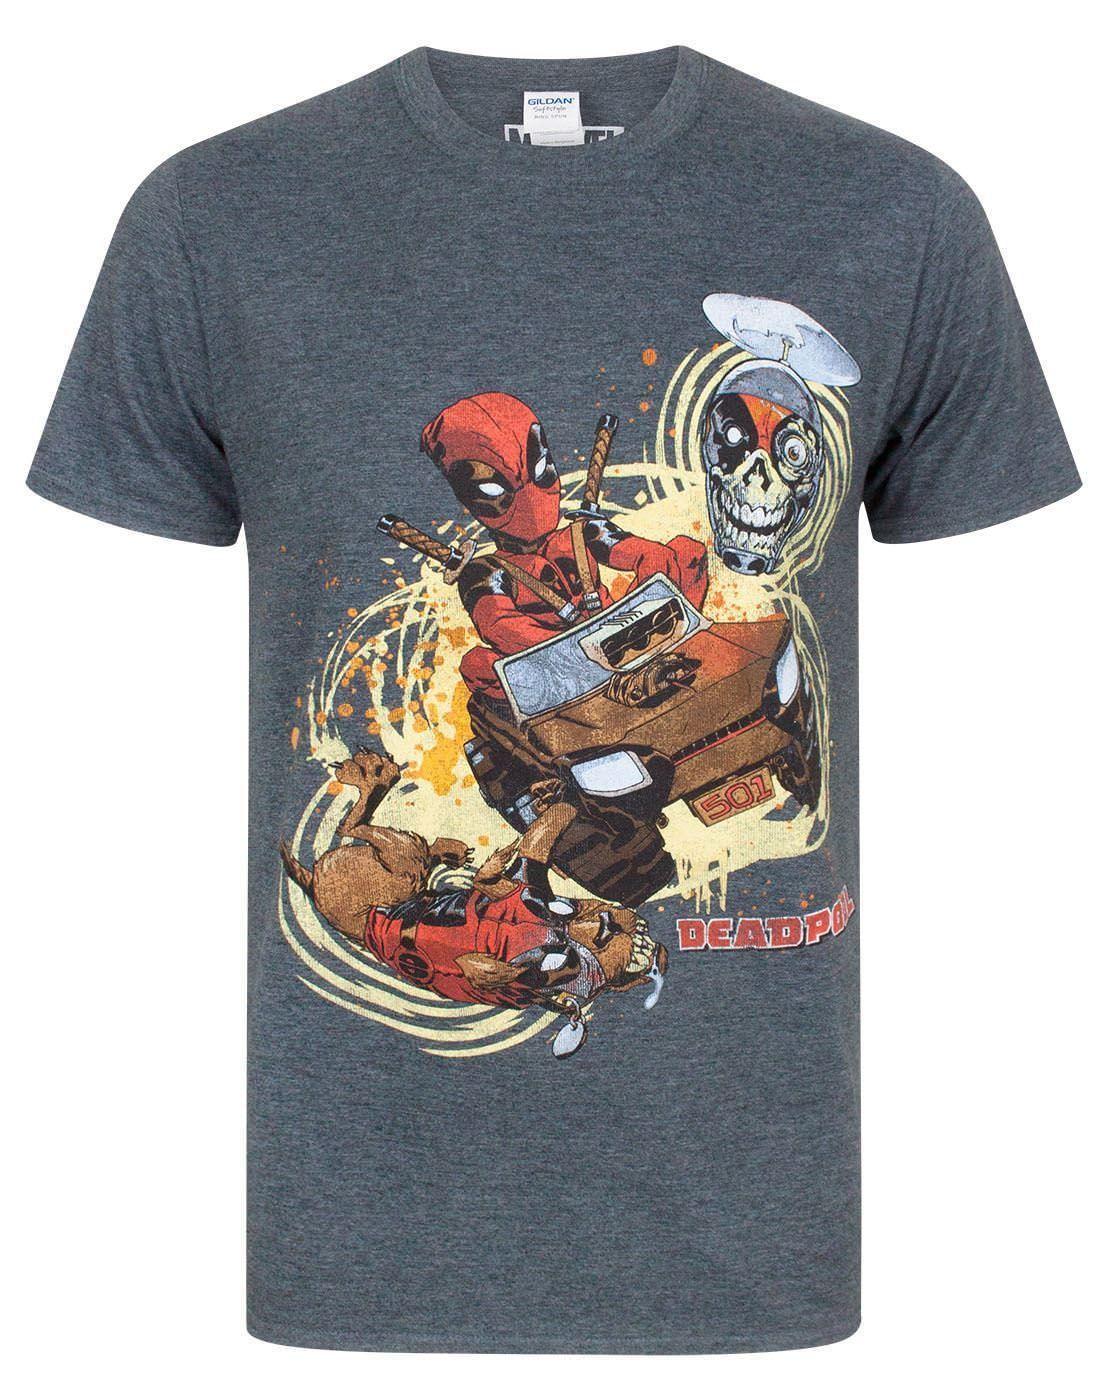 e4882bf6f Compre Marvel Comics Deadpool X Men Dogpool Headpool S XXXL Masculina  Carvão Marl T Shirt De Fcwmcu